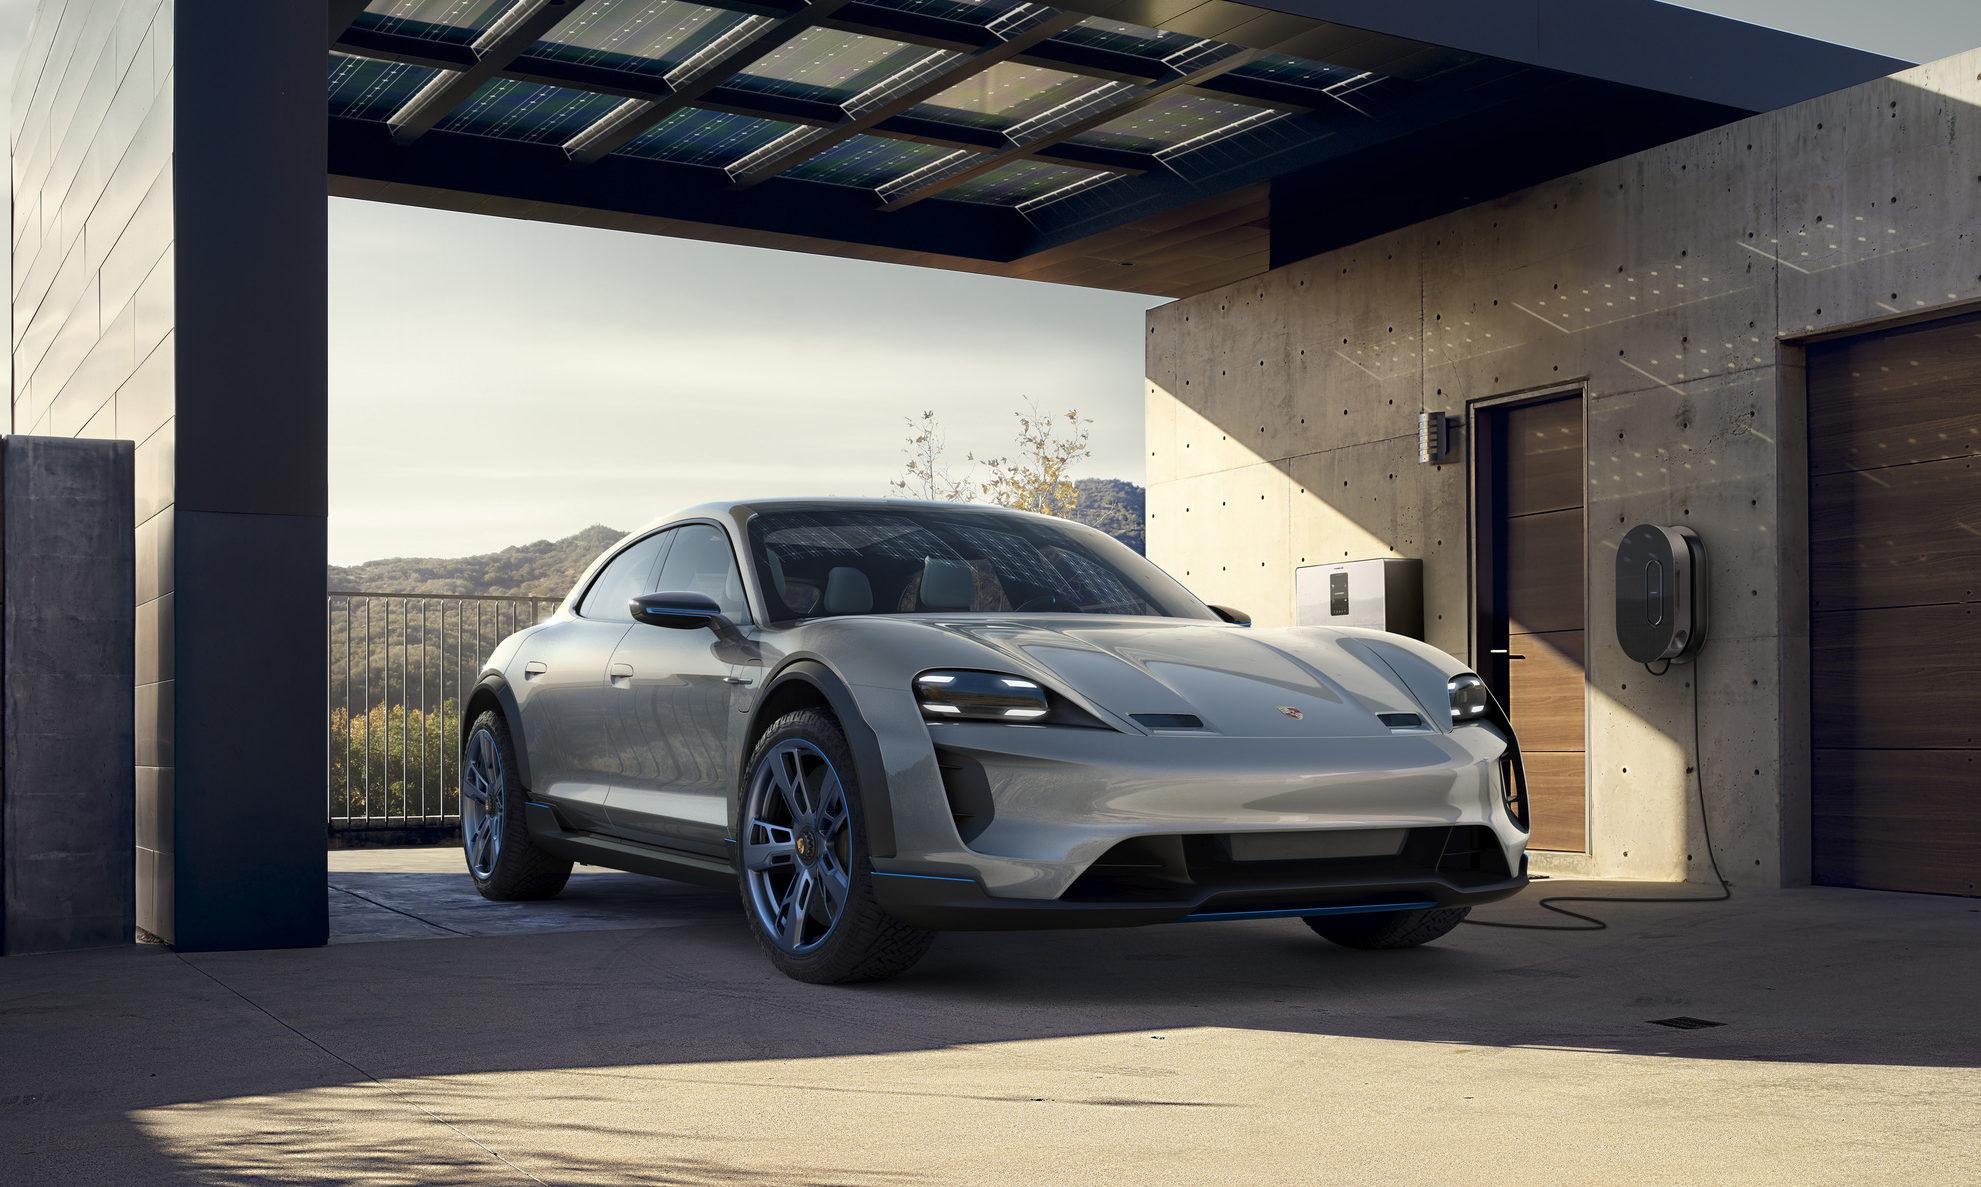 2018-Porsche-Mission-E-Cross-Turismo-charger